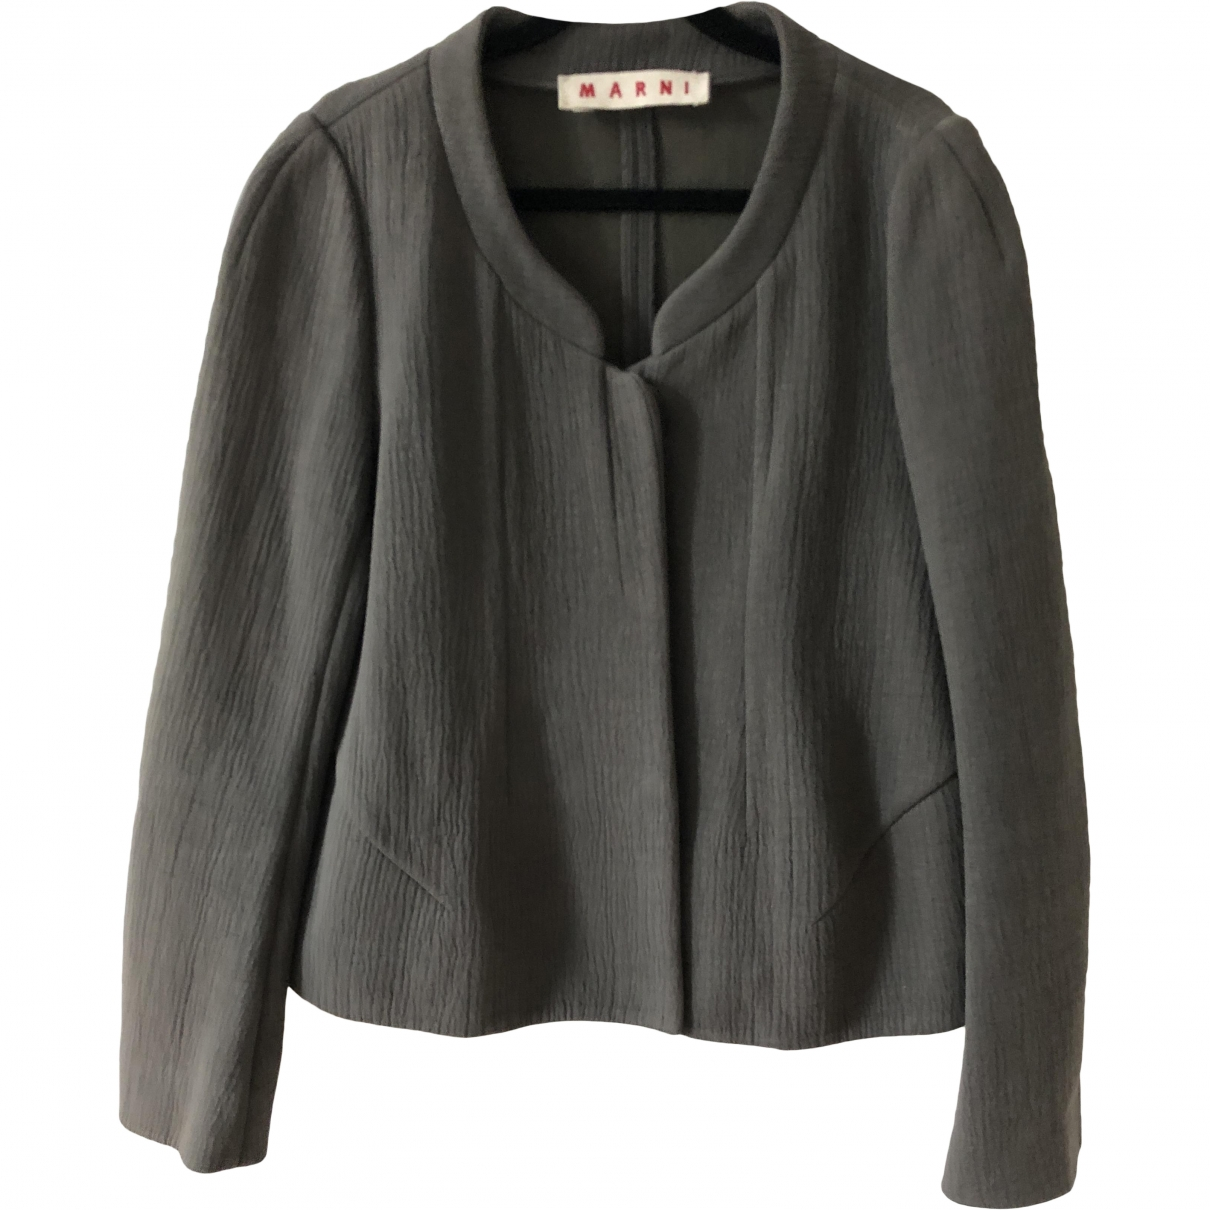 Marni \N Jacke in  Khaki Polyester